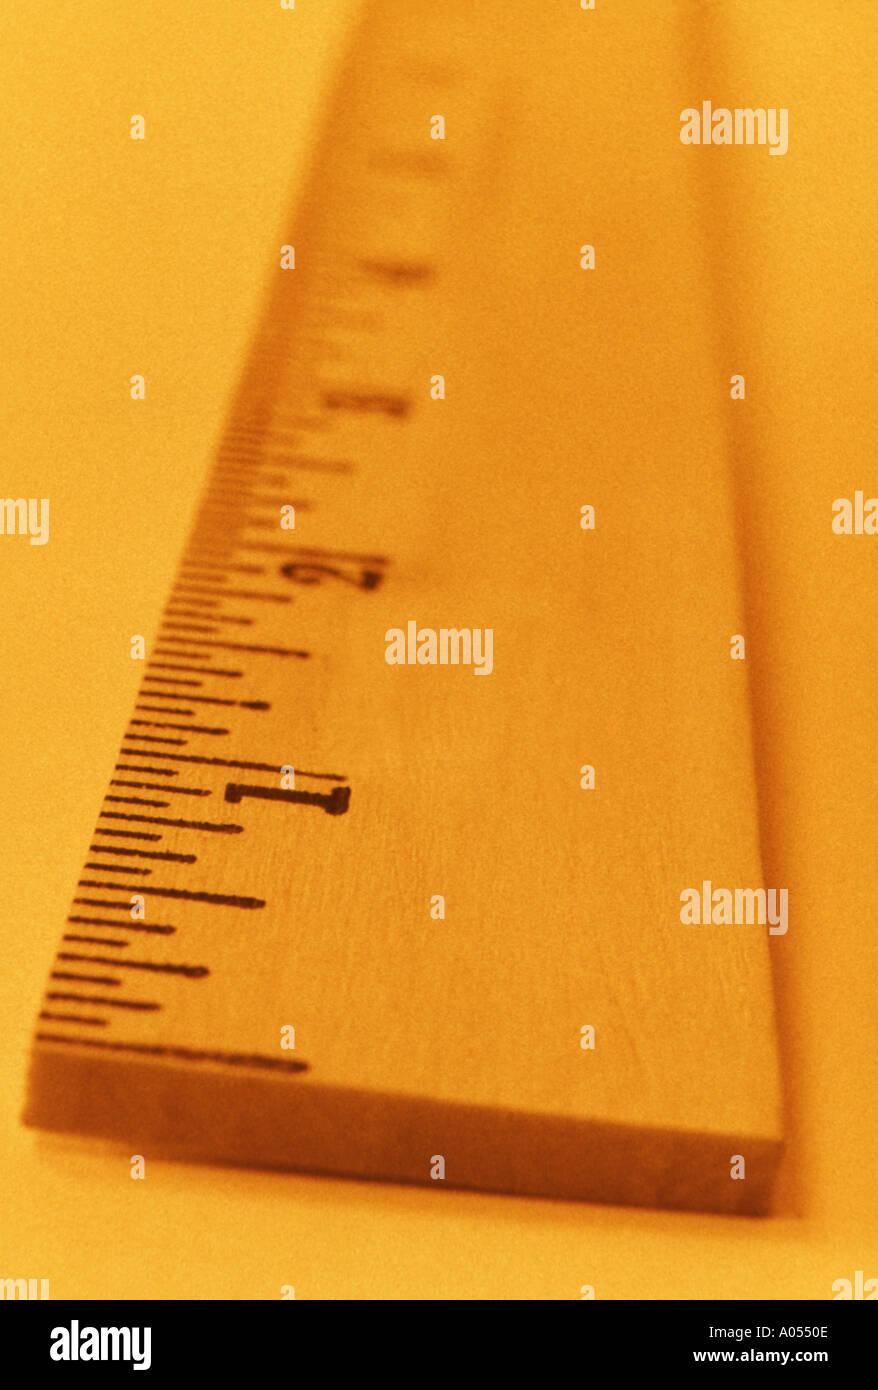 End Of Yardstick Orange Toned Selective Focus - Stock Image